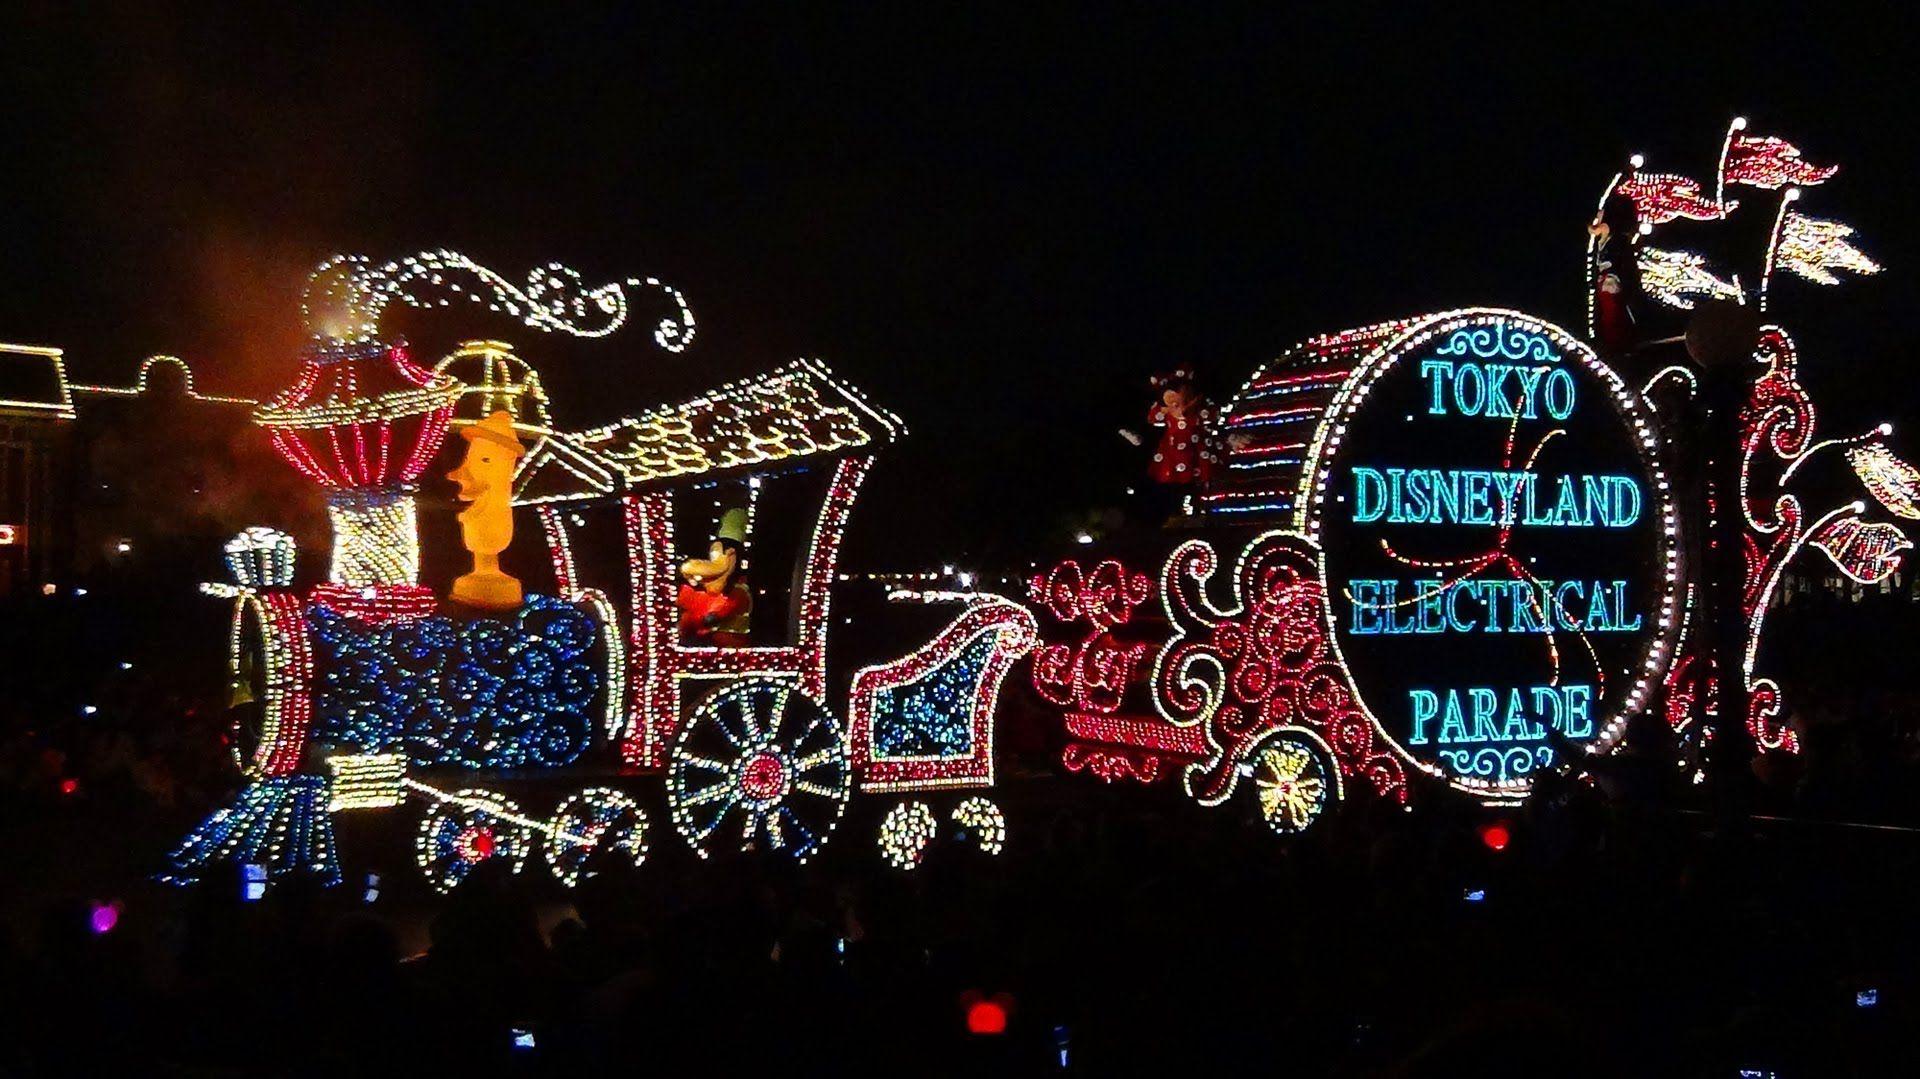 Tokyo Disneyland Electrical Parade Dream Lights in 3 minutes Japan